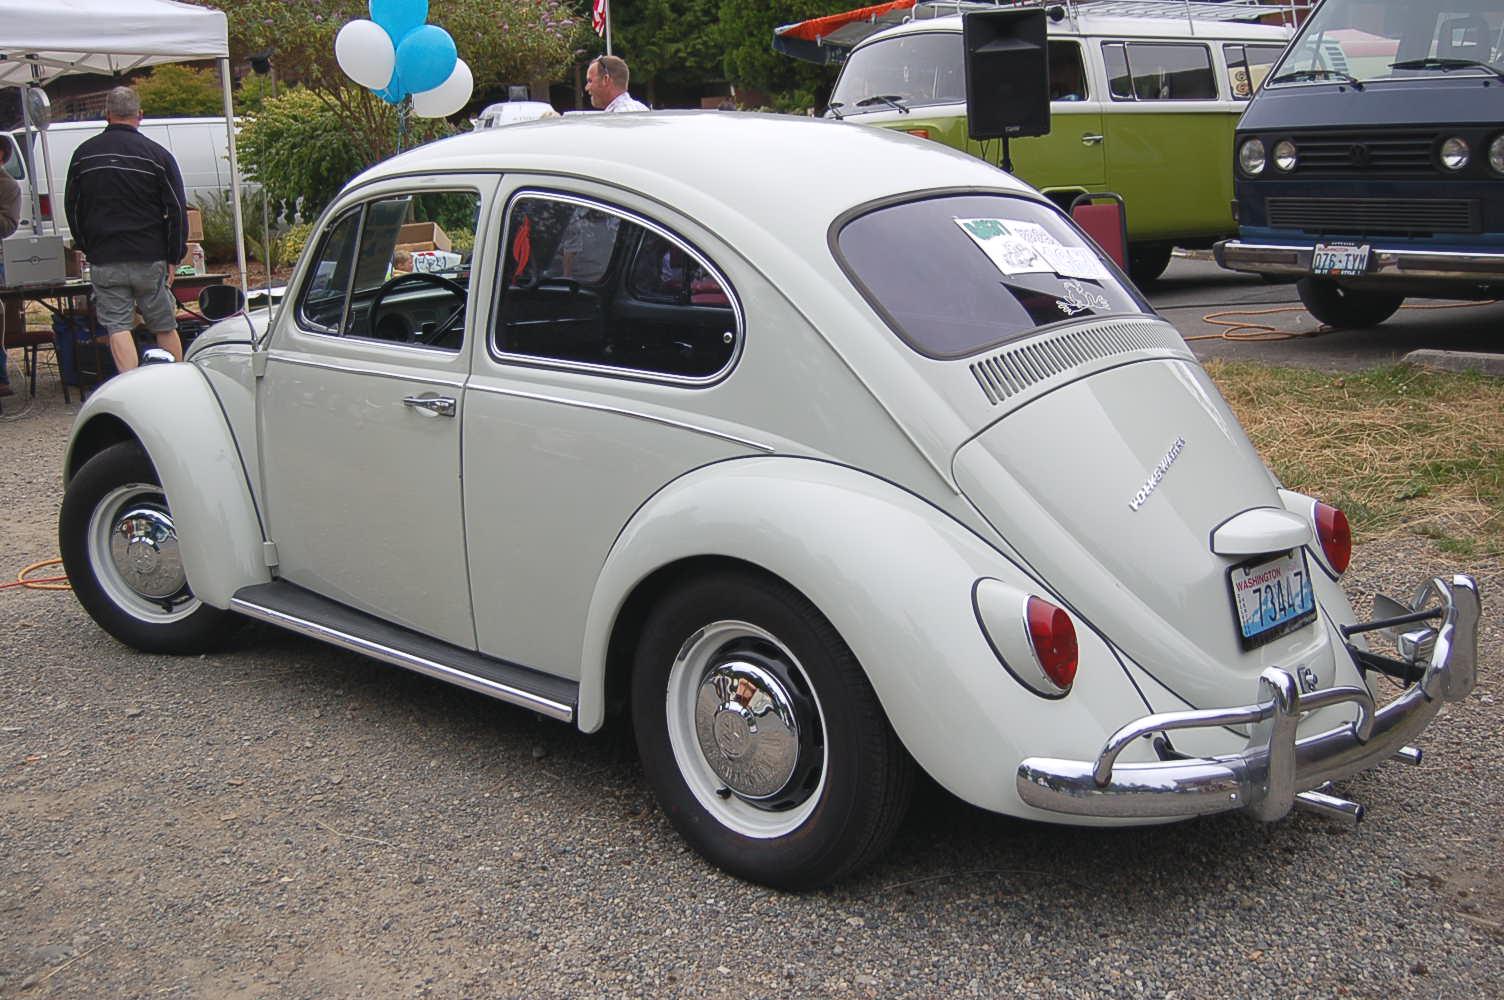 Wiring further 86 2014 Volkswagen Golf Vii Variant Wagon Revealed also Vw Bug Emergency Flasher Wiring Diagram additionally 1310759 in addition Sabes  o Funciona El Motor De Tu. on 1967 vw beetle engine diagram